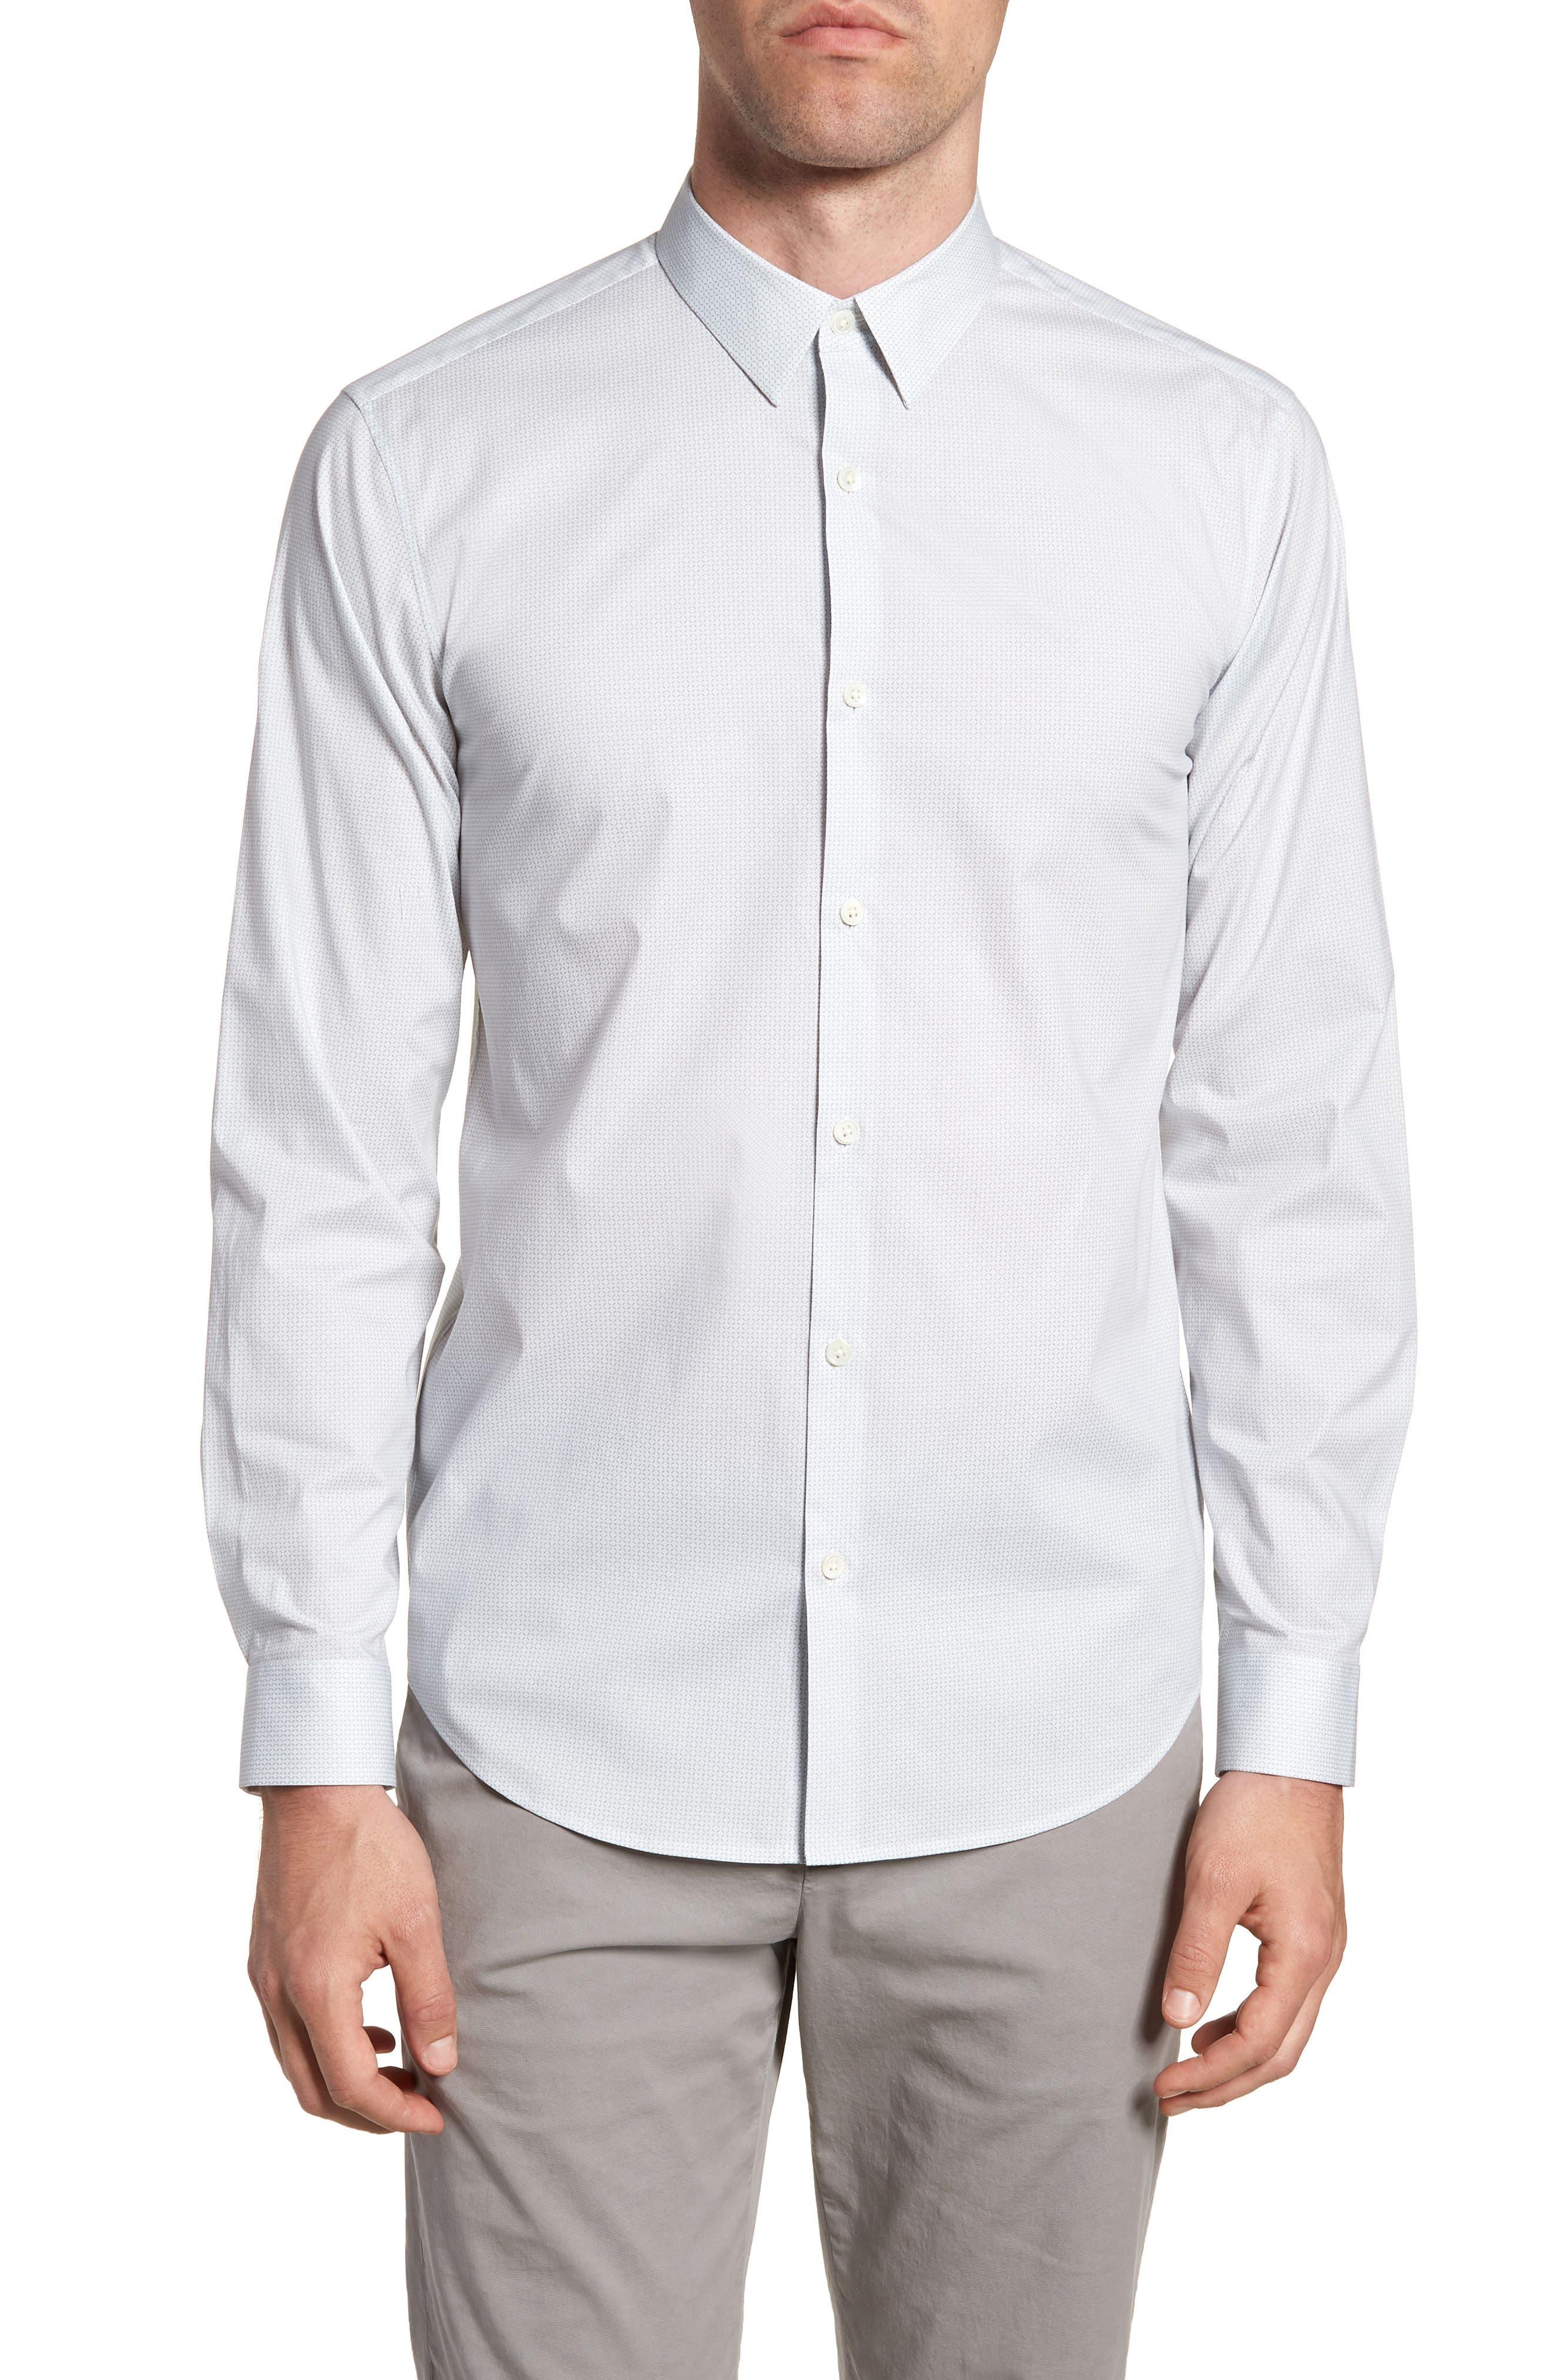 Irving Sillar Slim Fit Sport Shirt,                             Main thumbnail 1, color,                             097